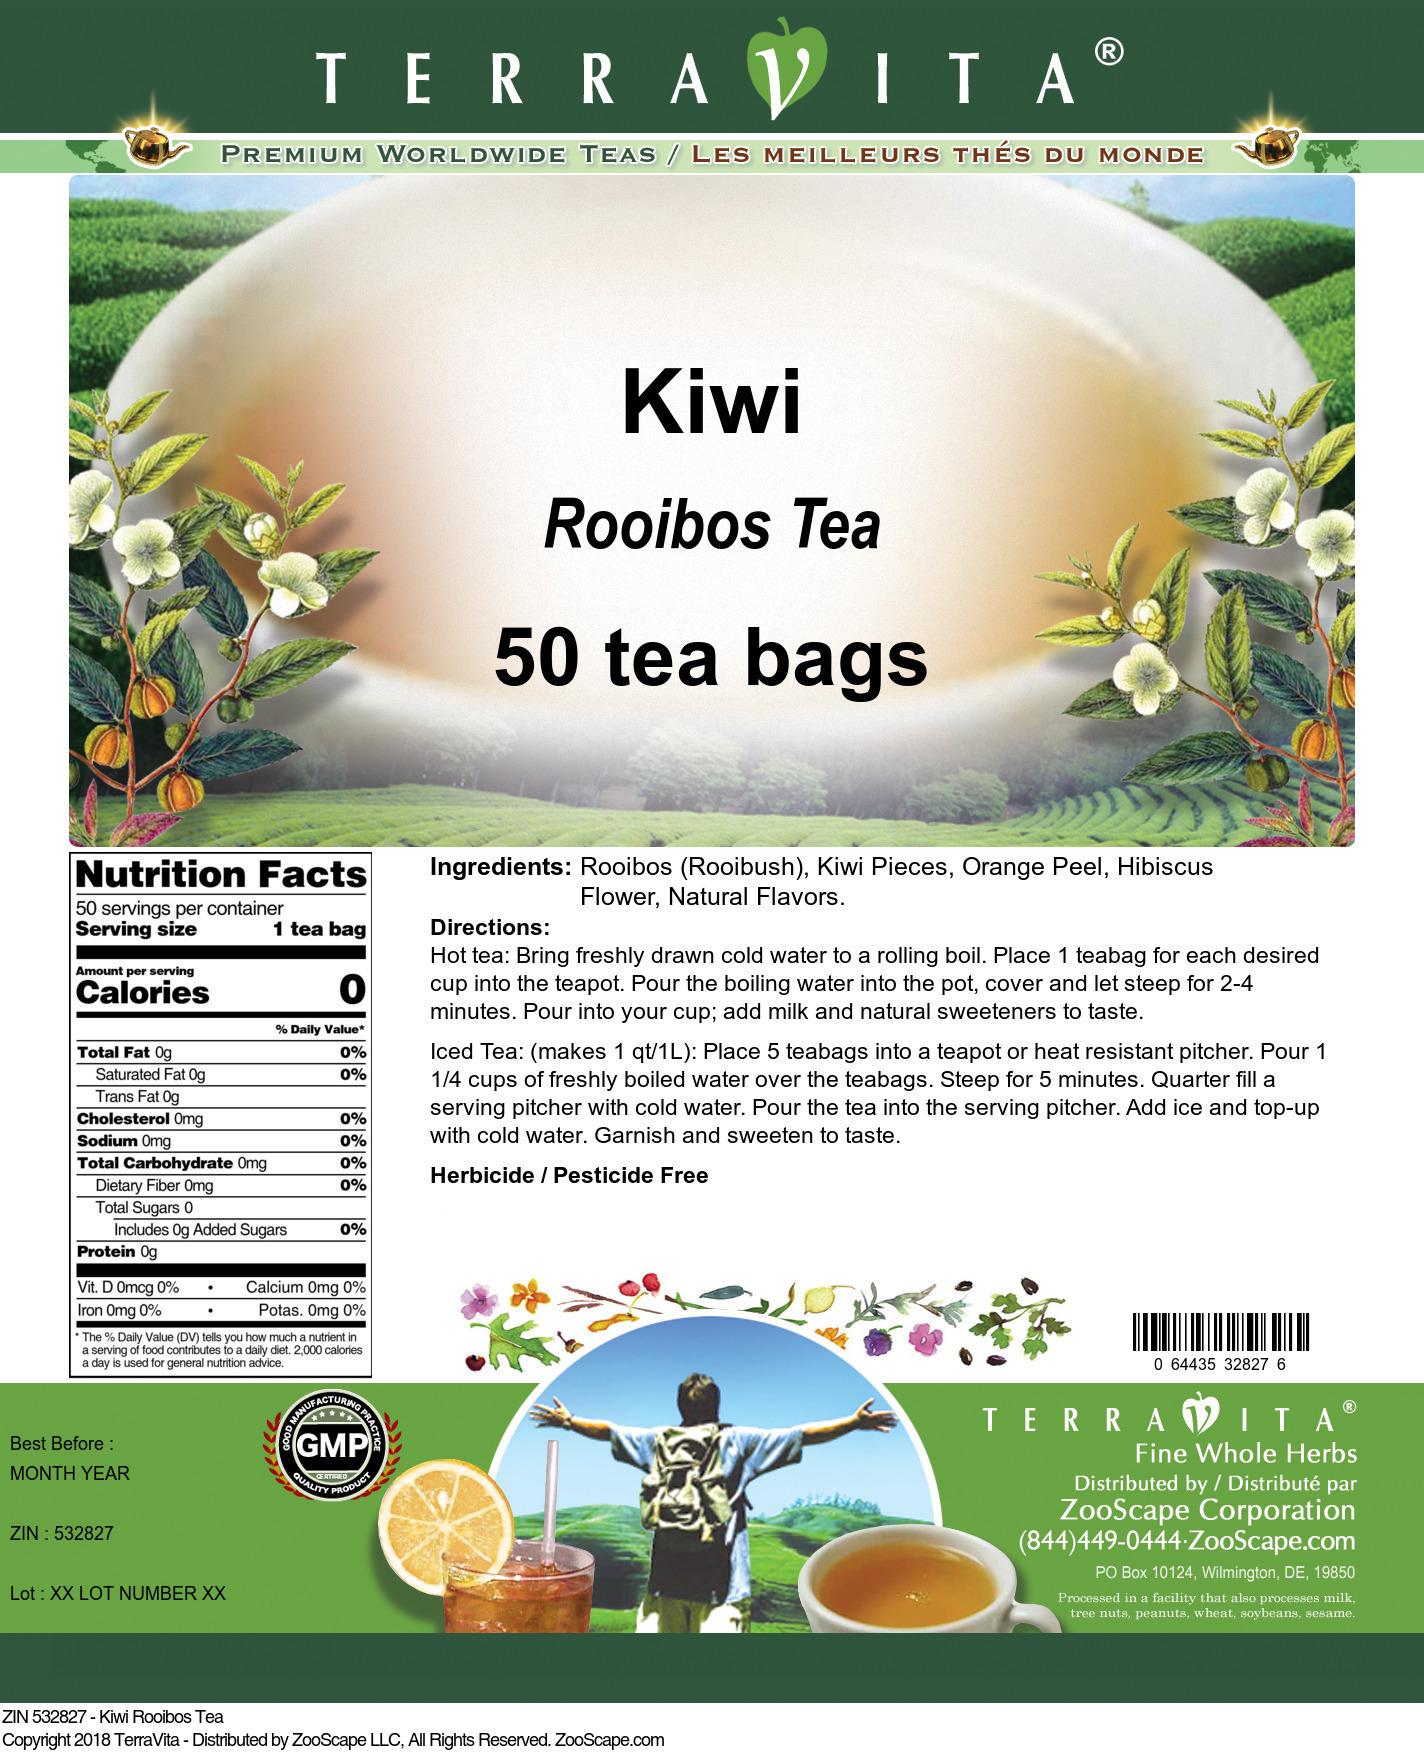 Kiwi Rooibos Tea